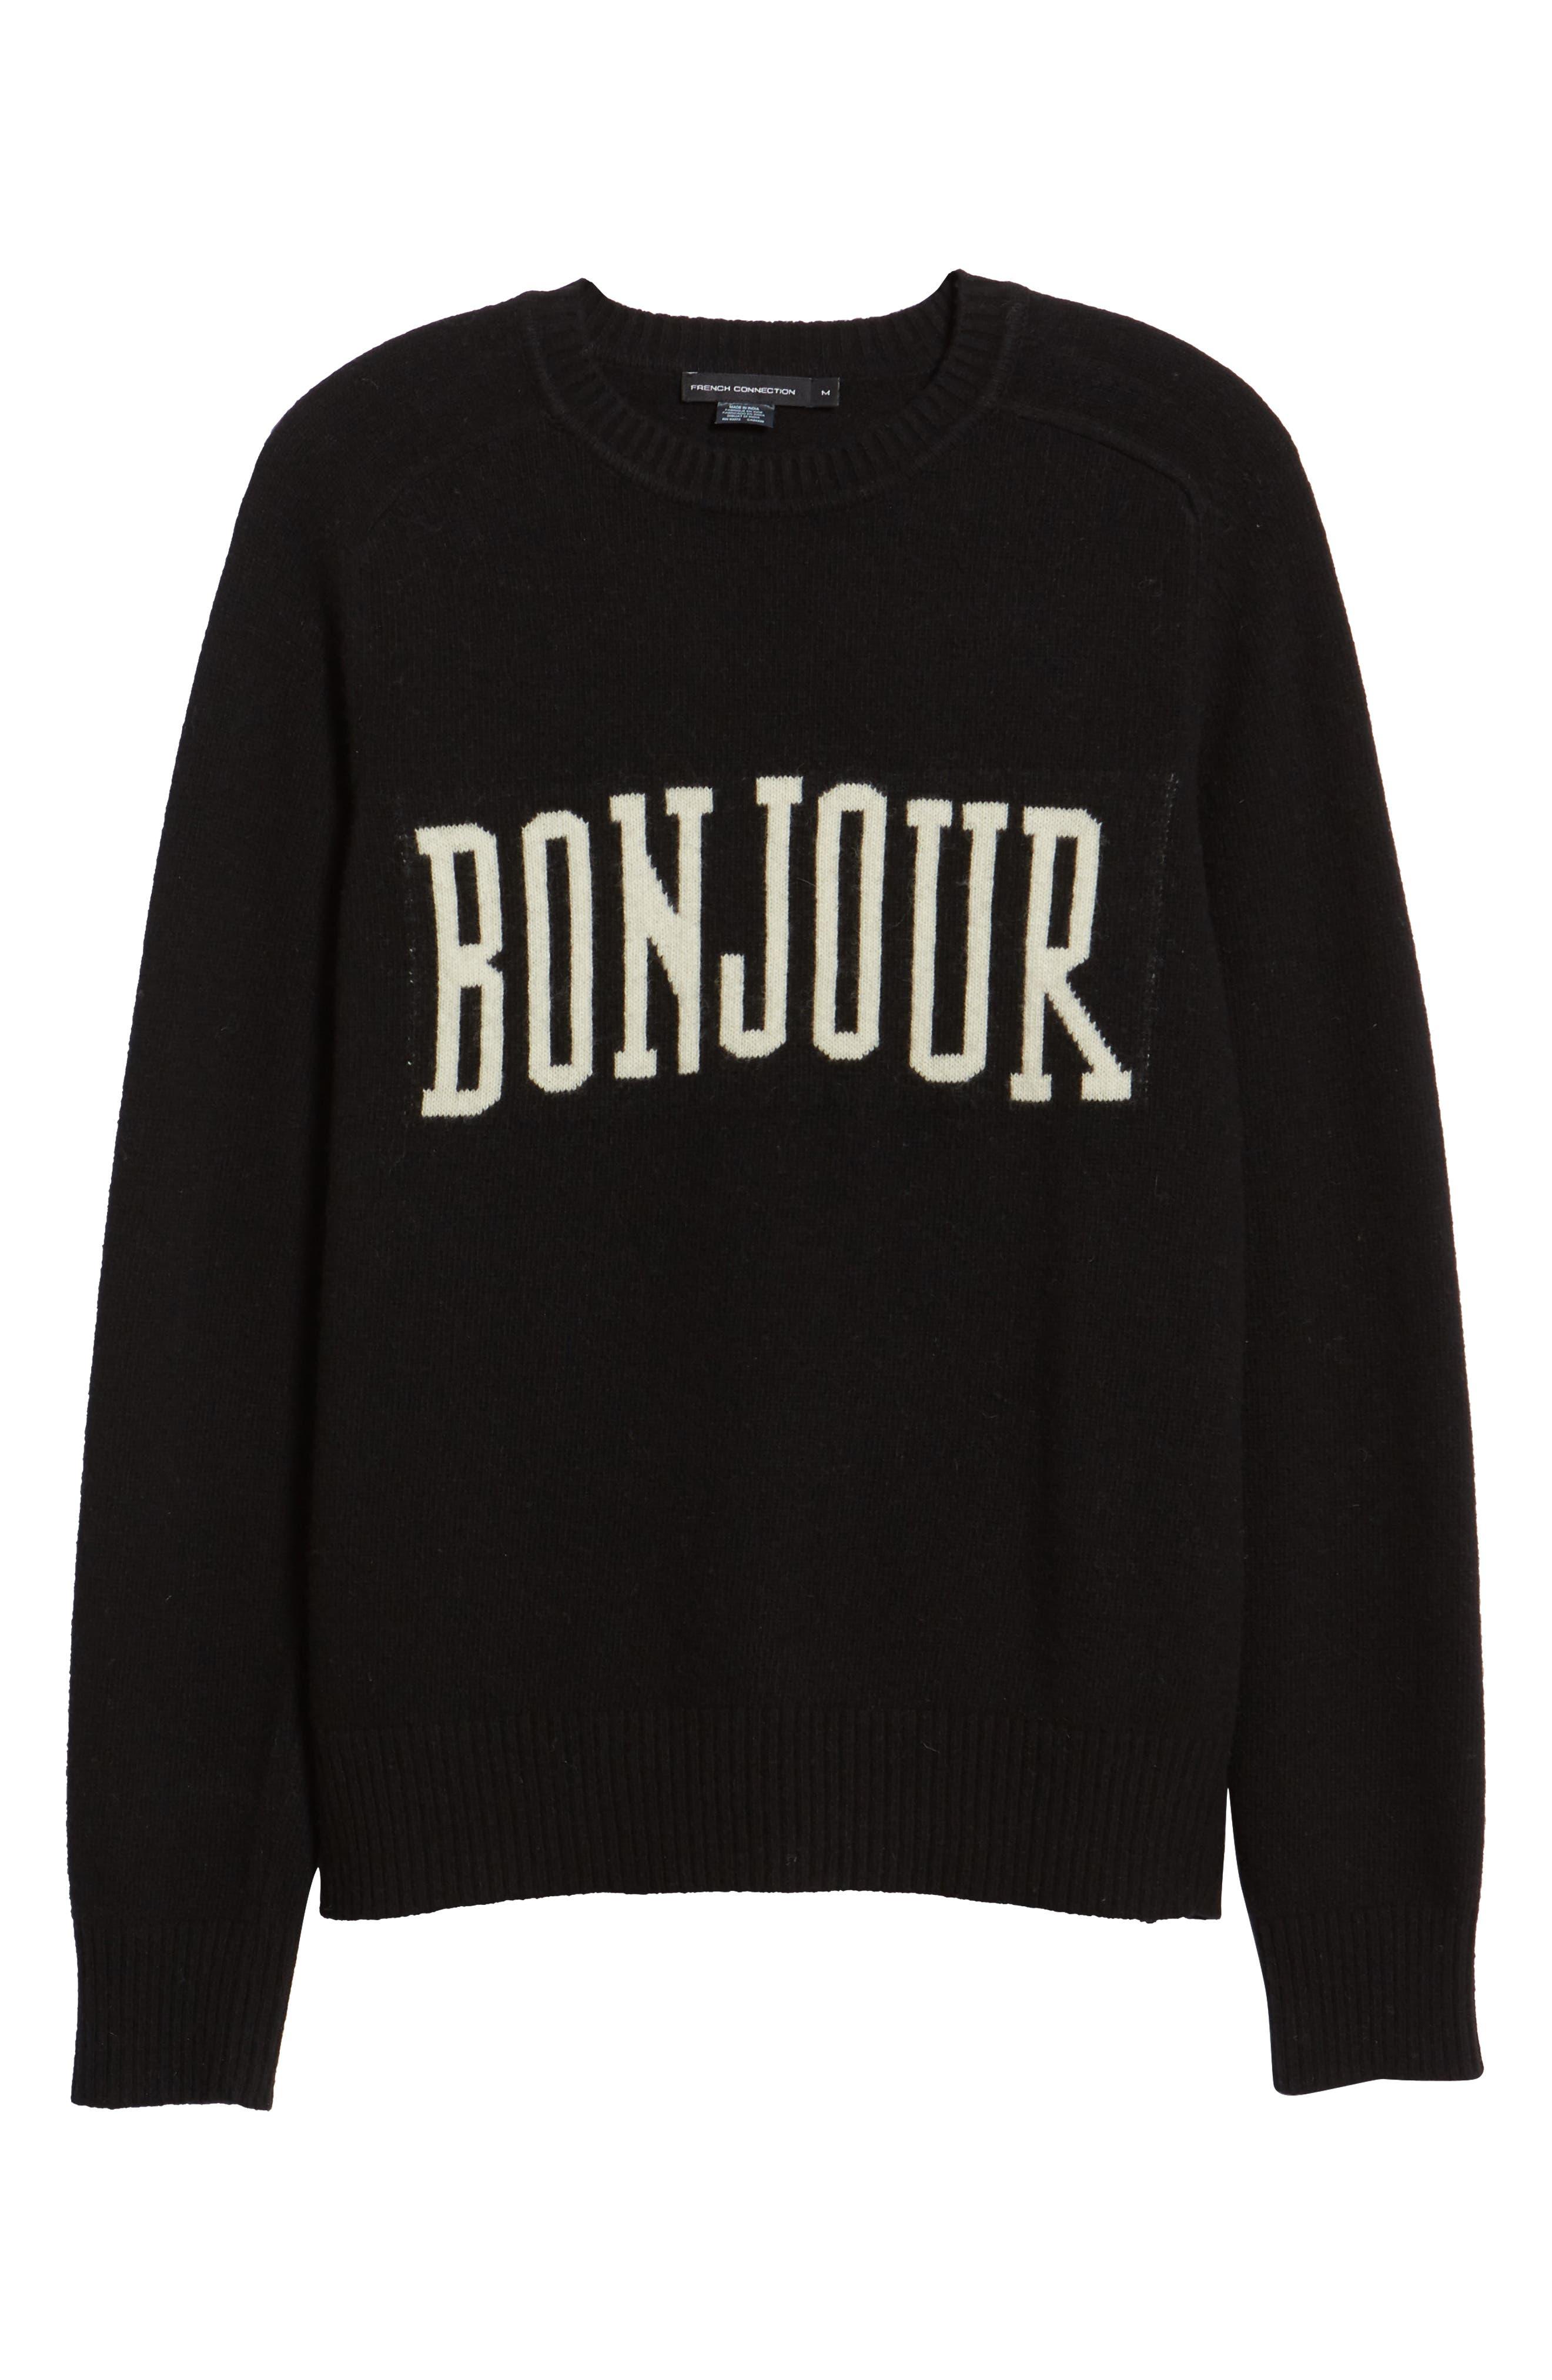 Bonjour Wool Blend Sweater,                             Alternate thumbnail 6, color,                             BLACK WHITECAP GREY